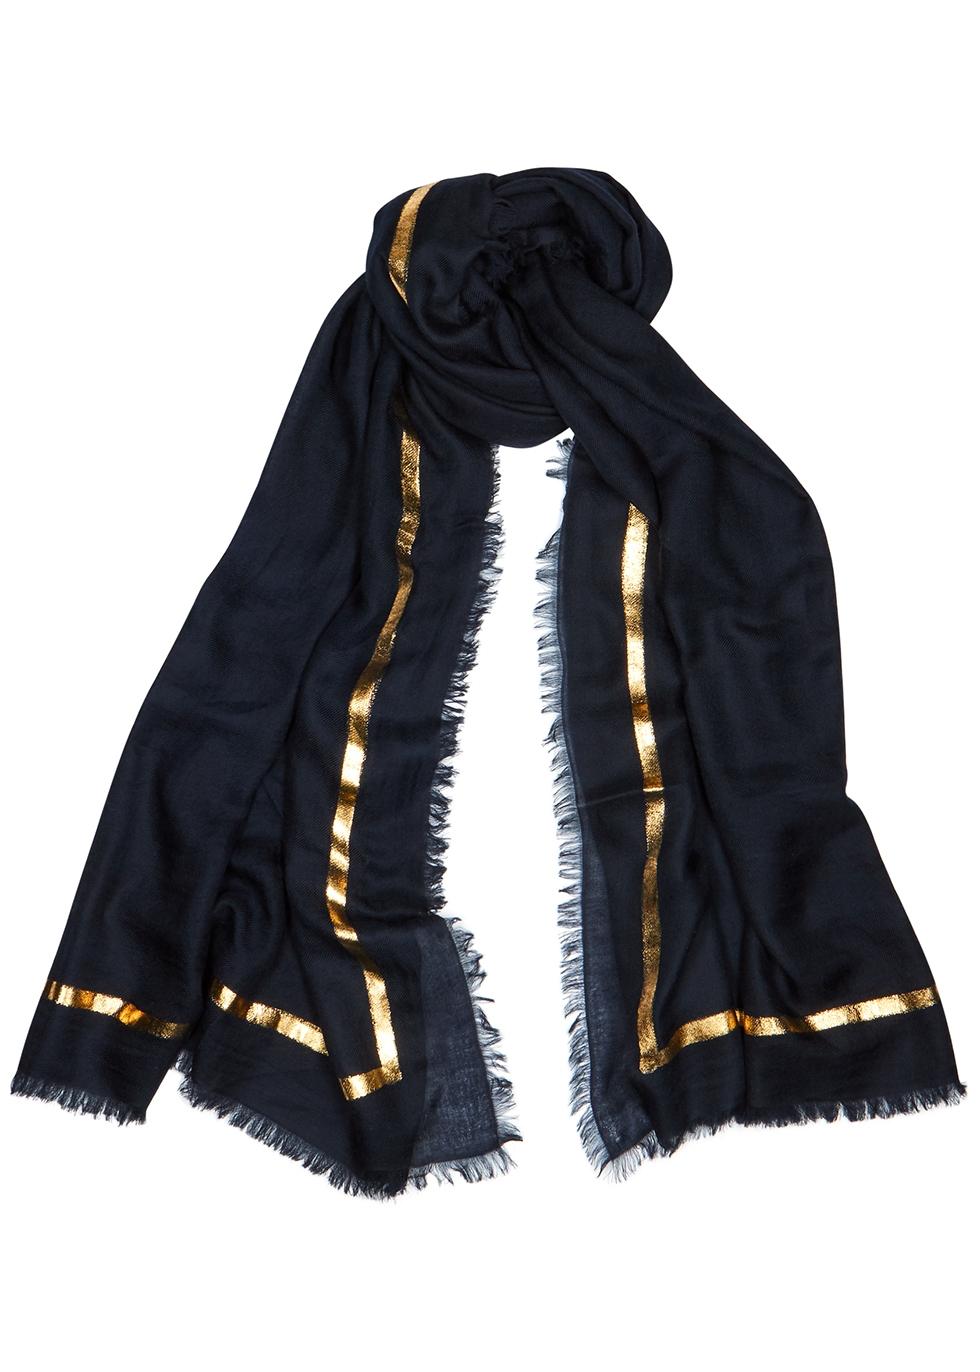 Righino foil-print cashmere scarf